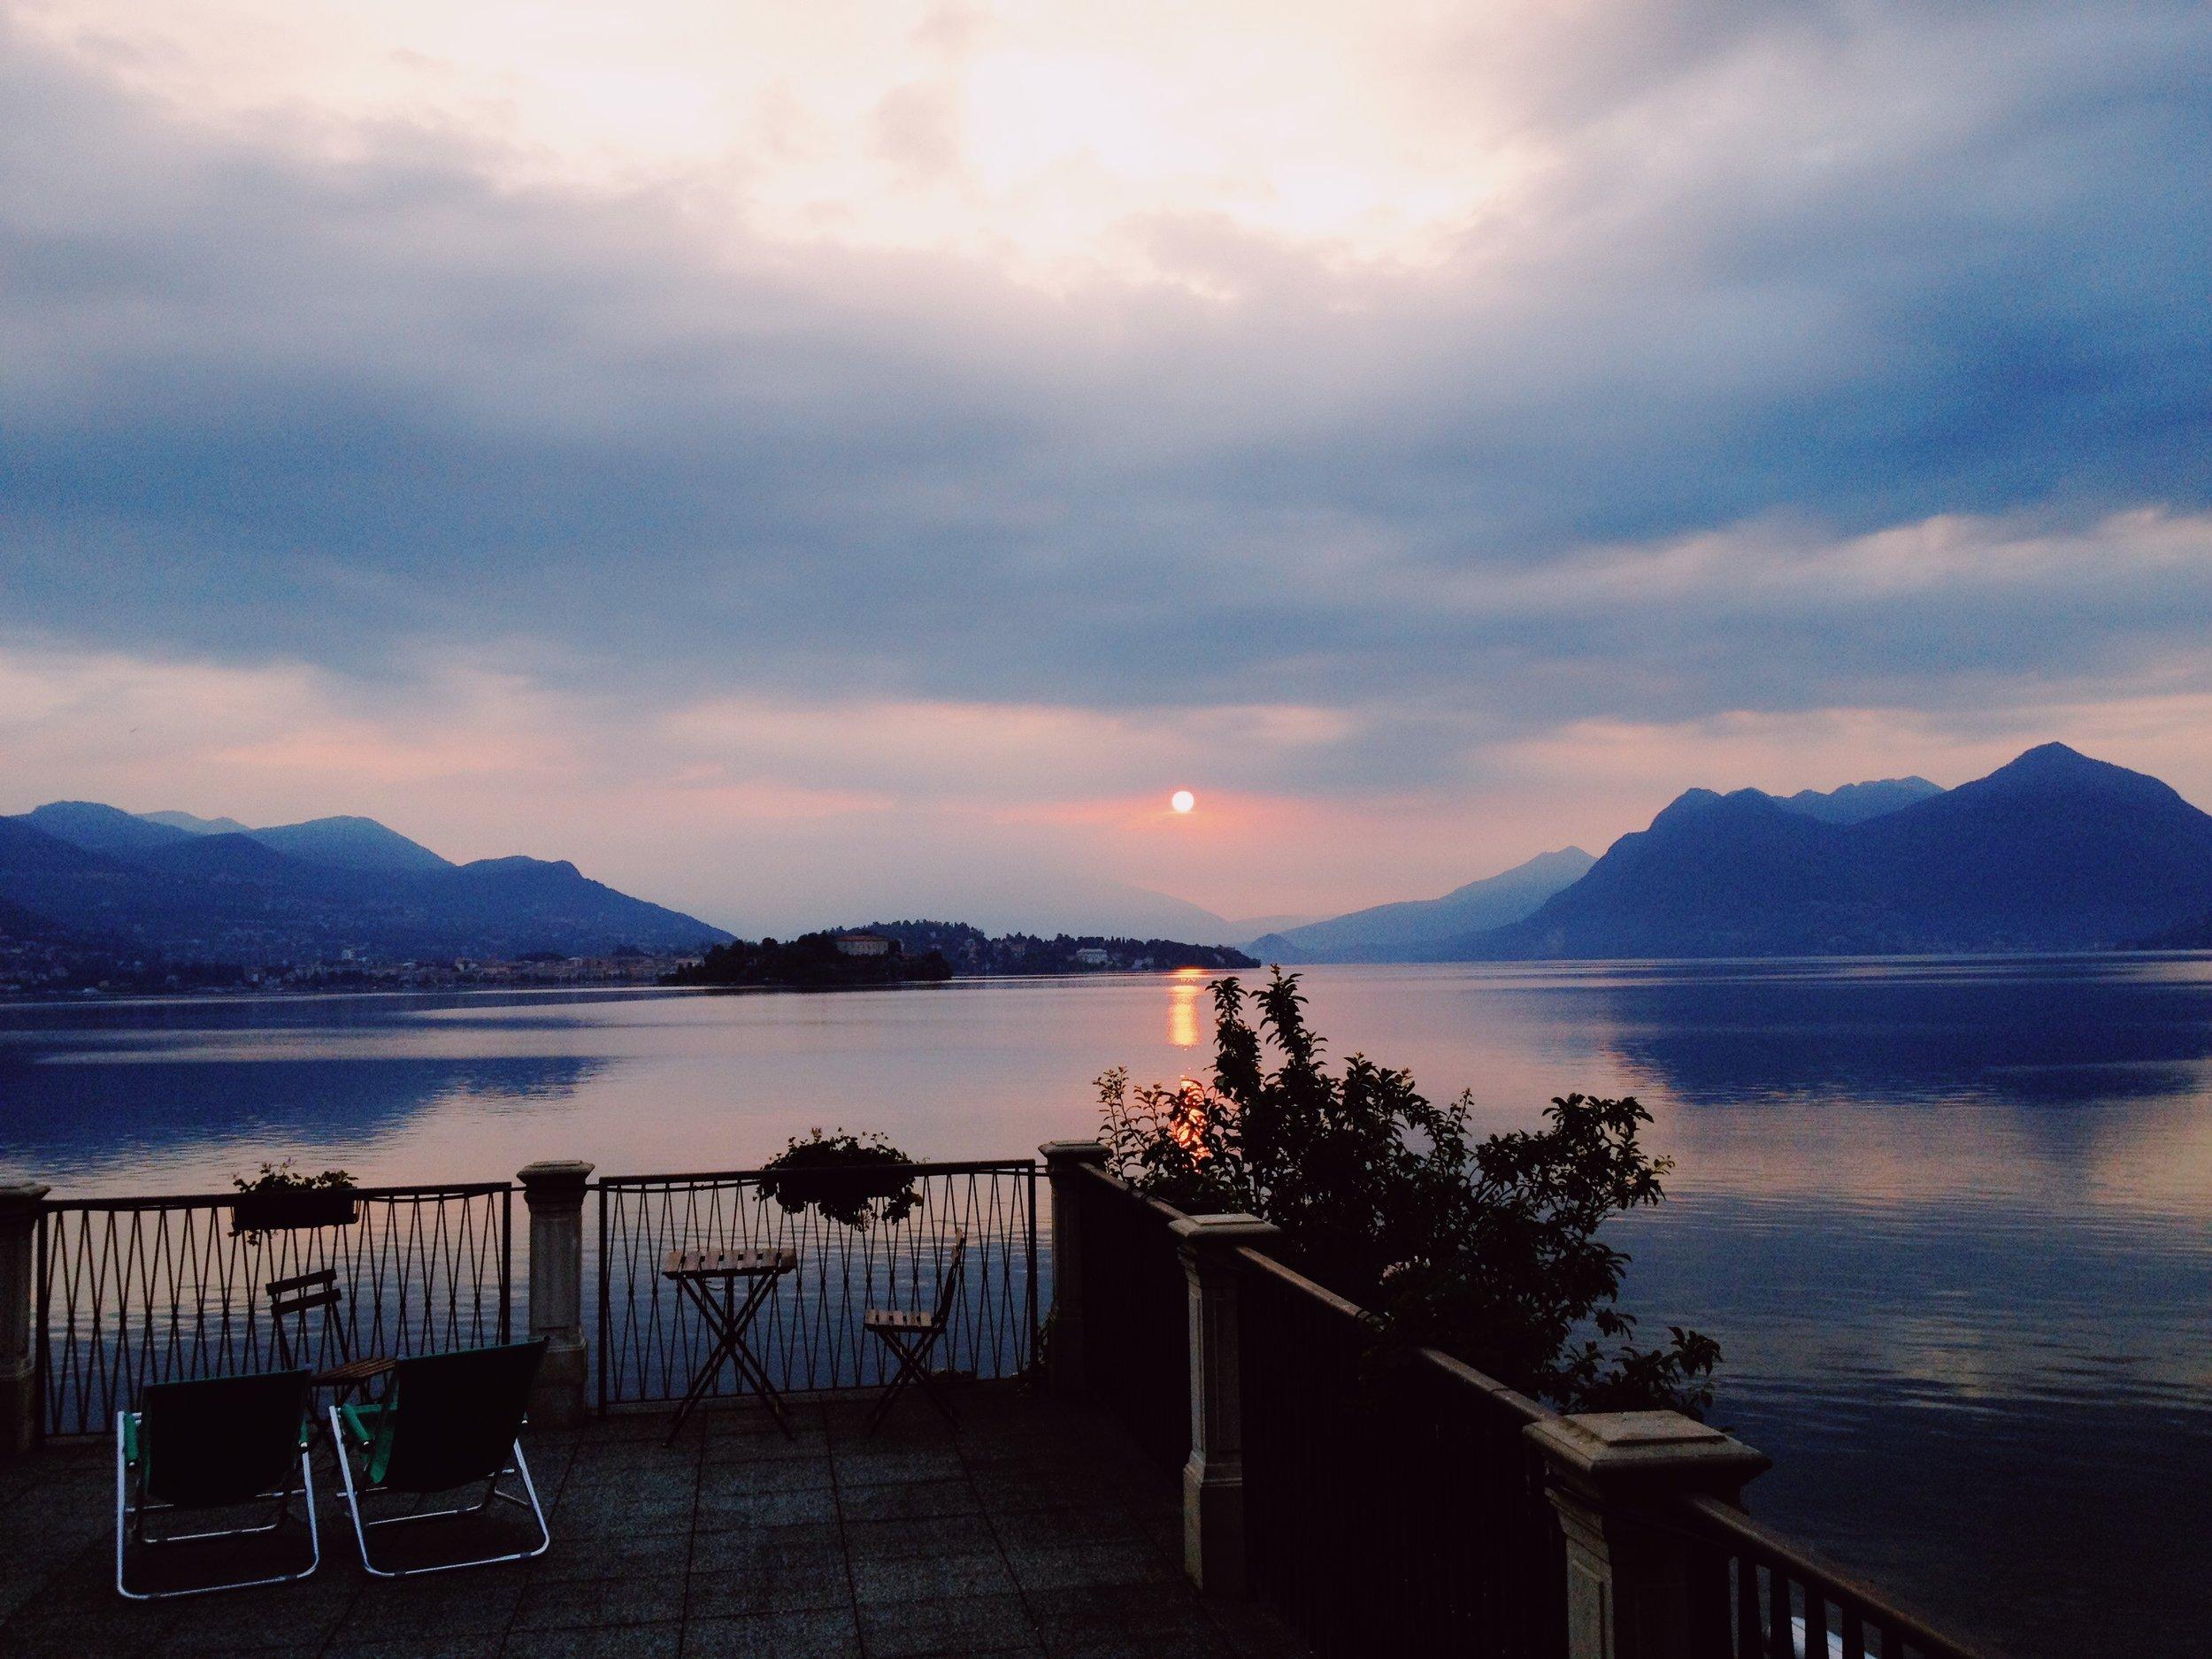 Italie - Lac majeur